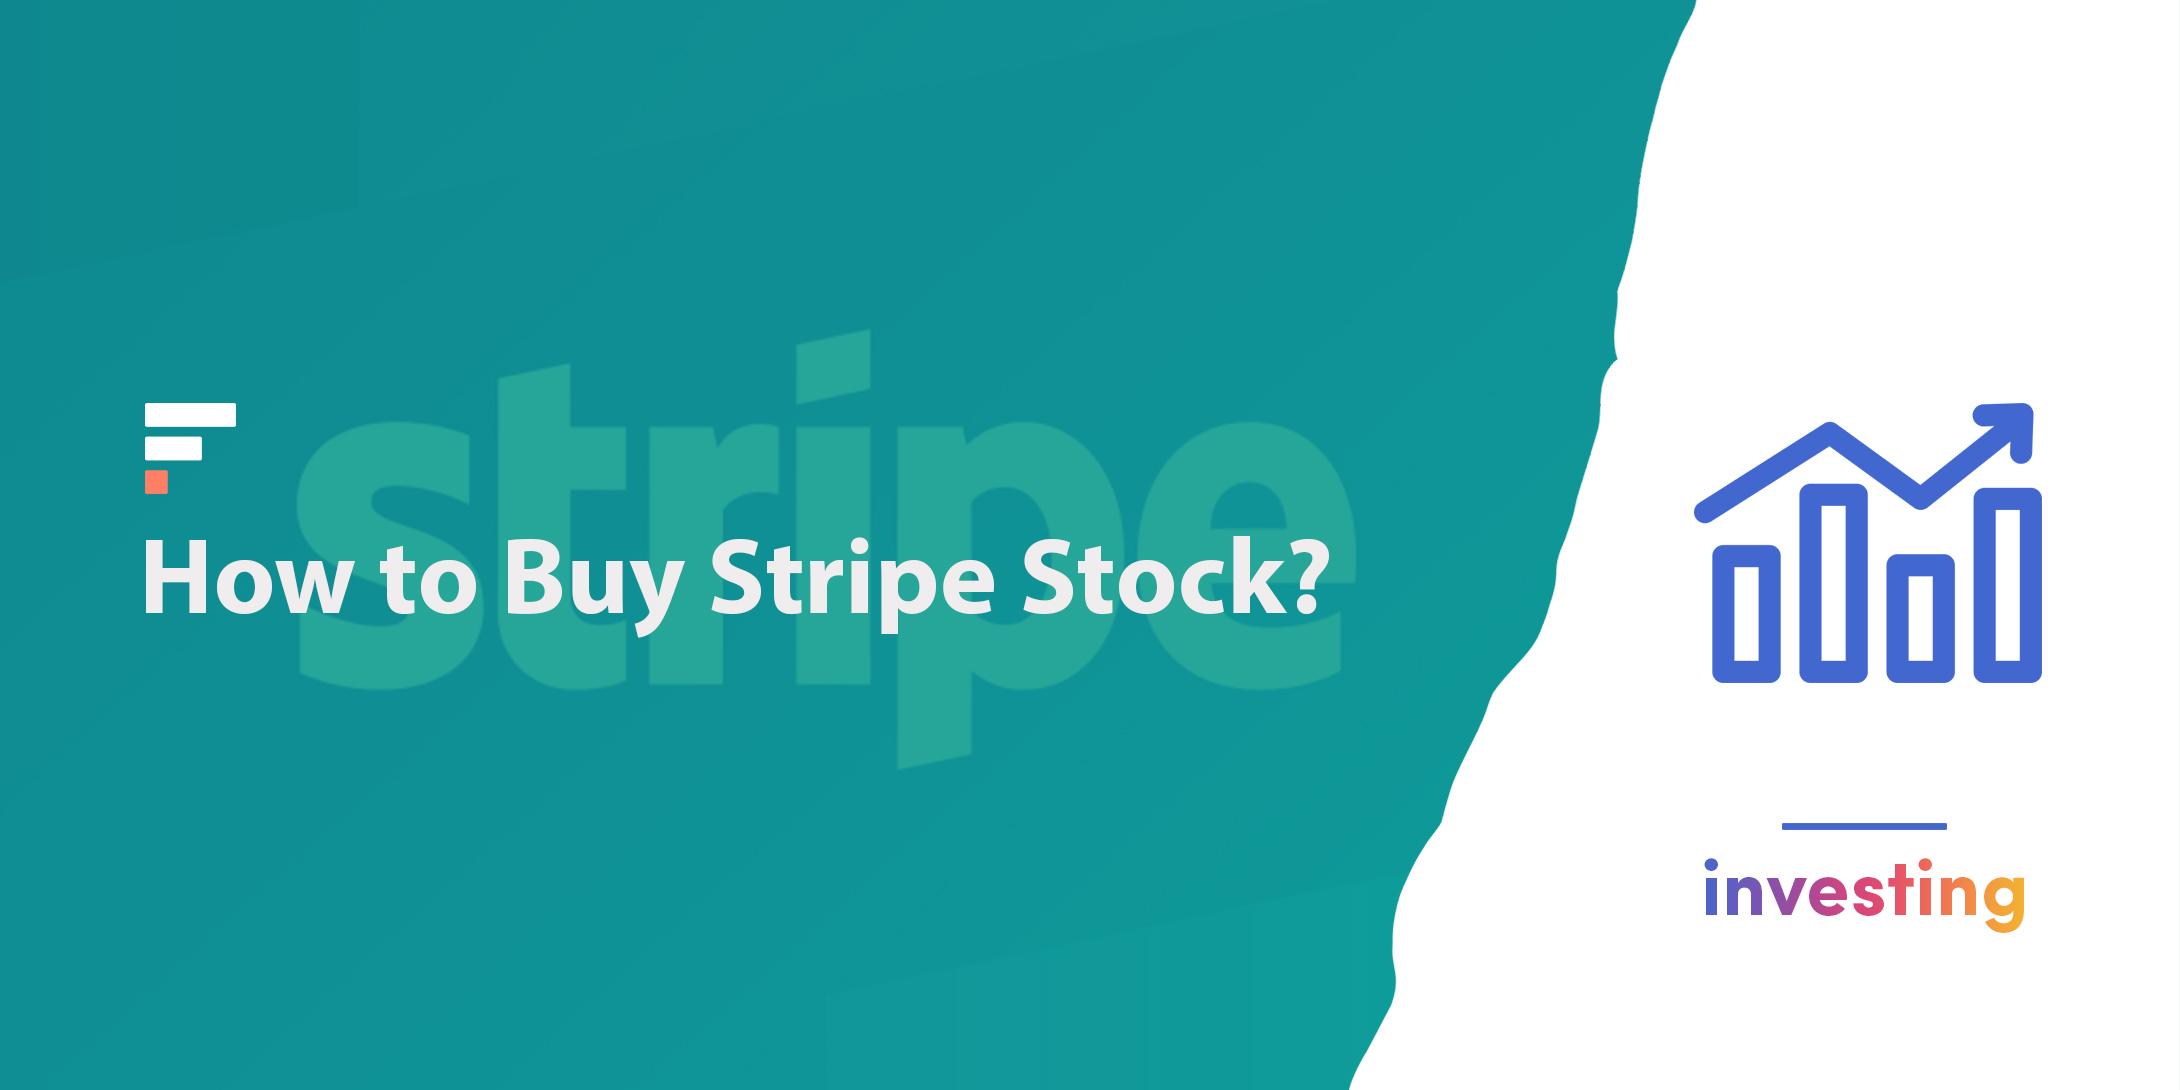 How to Buy Stripe Stock